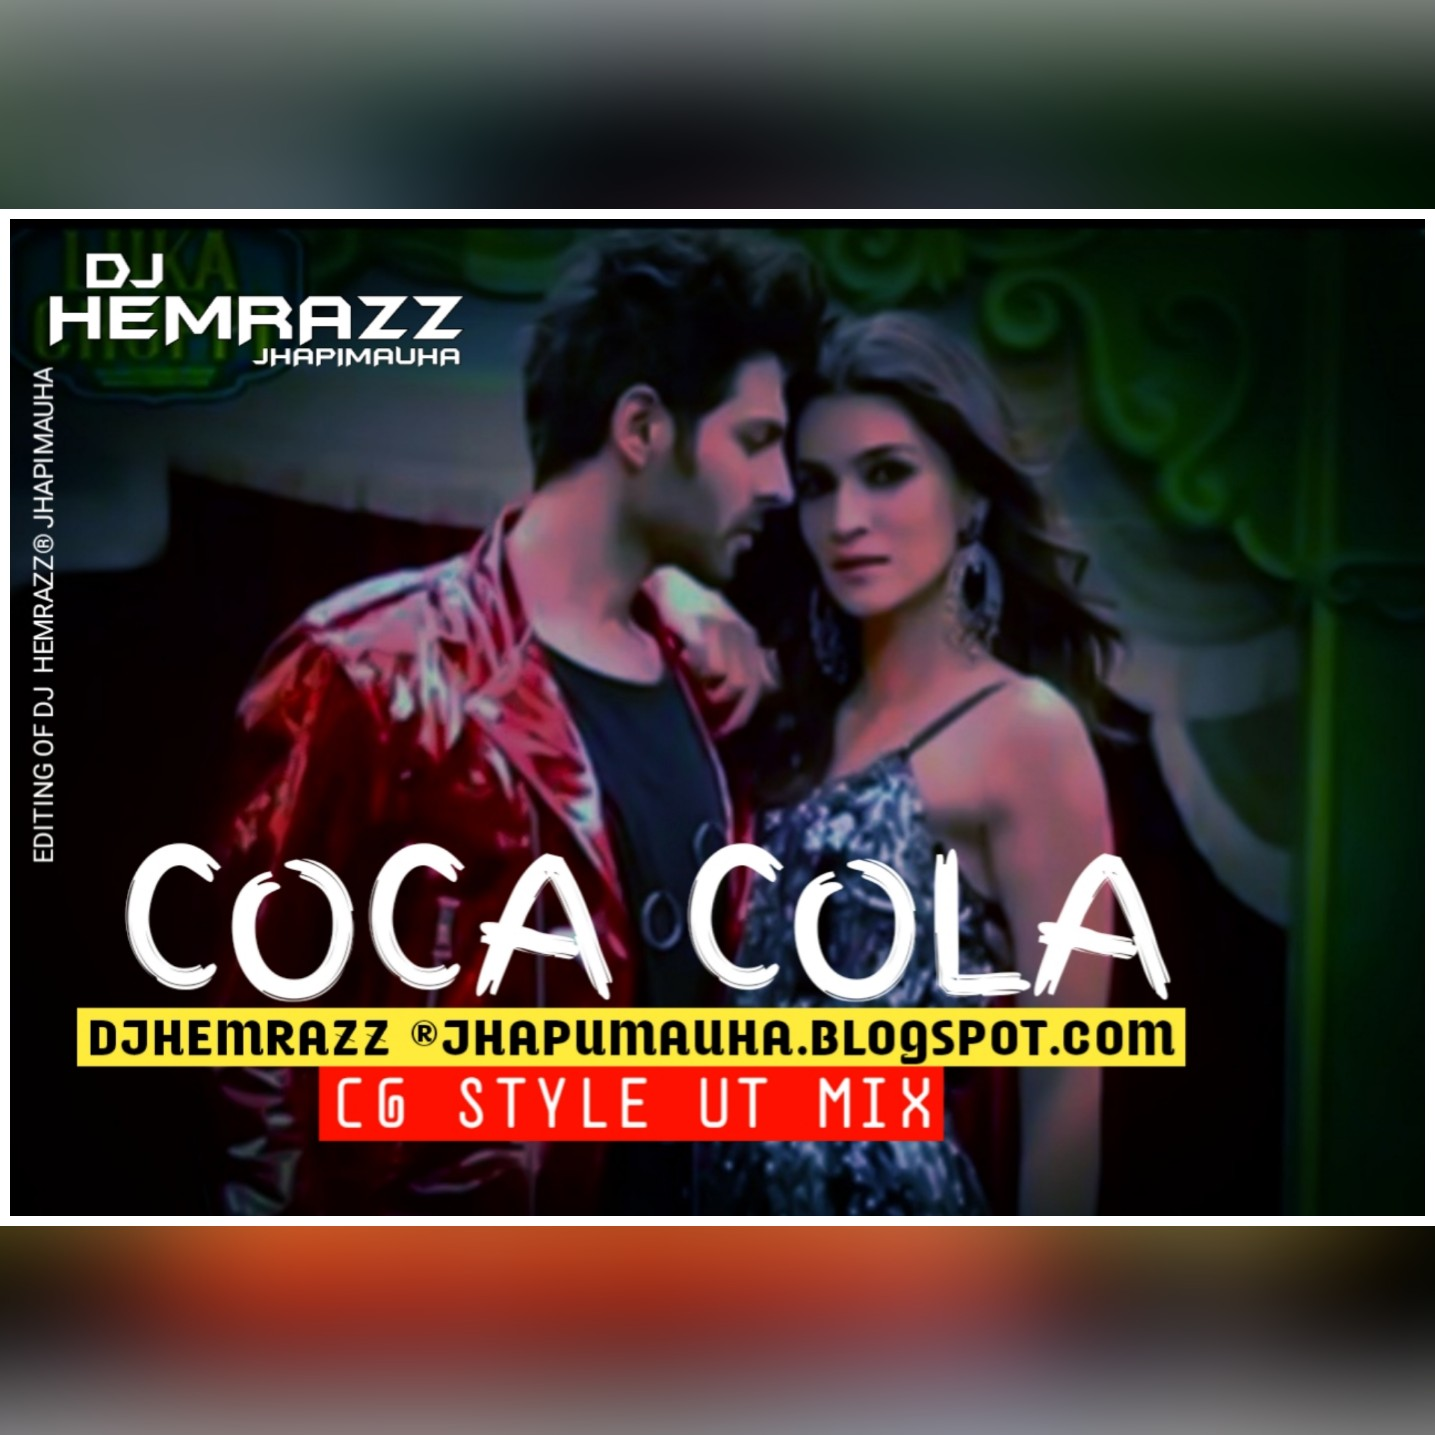 Coca cola tu dj